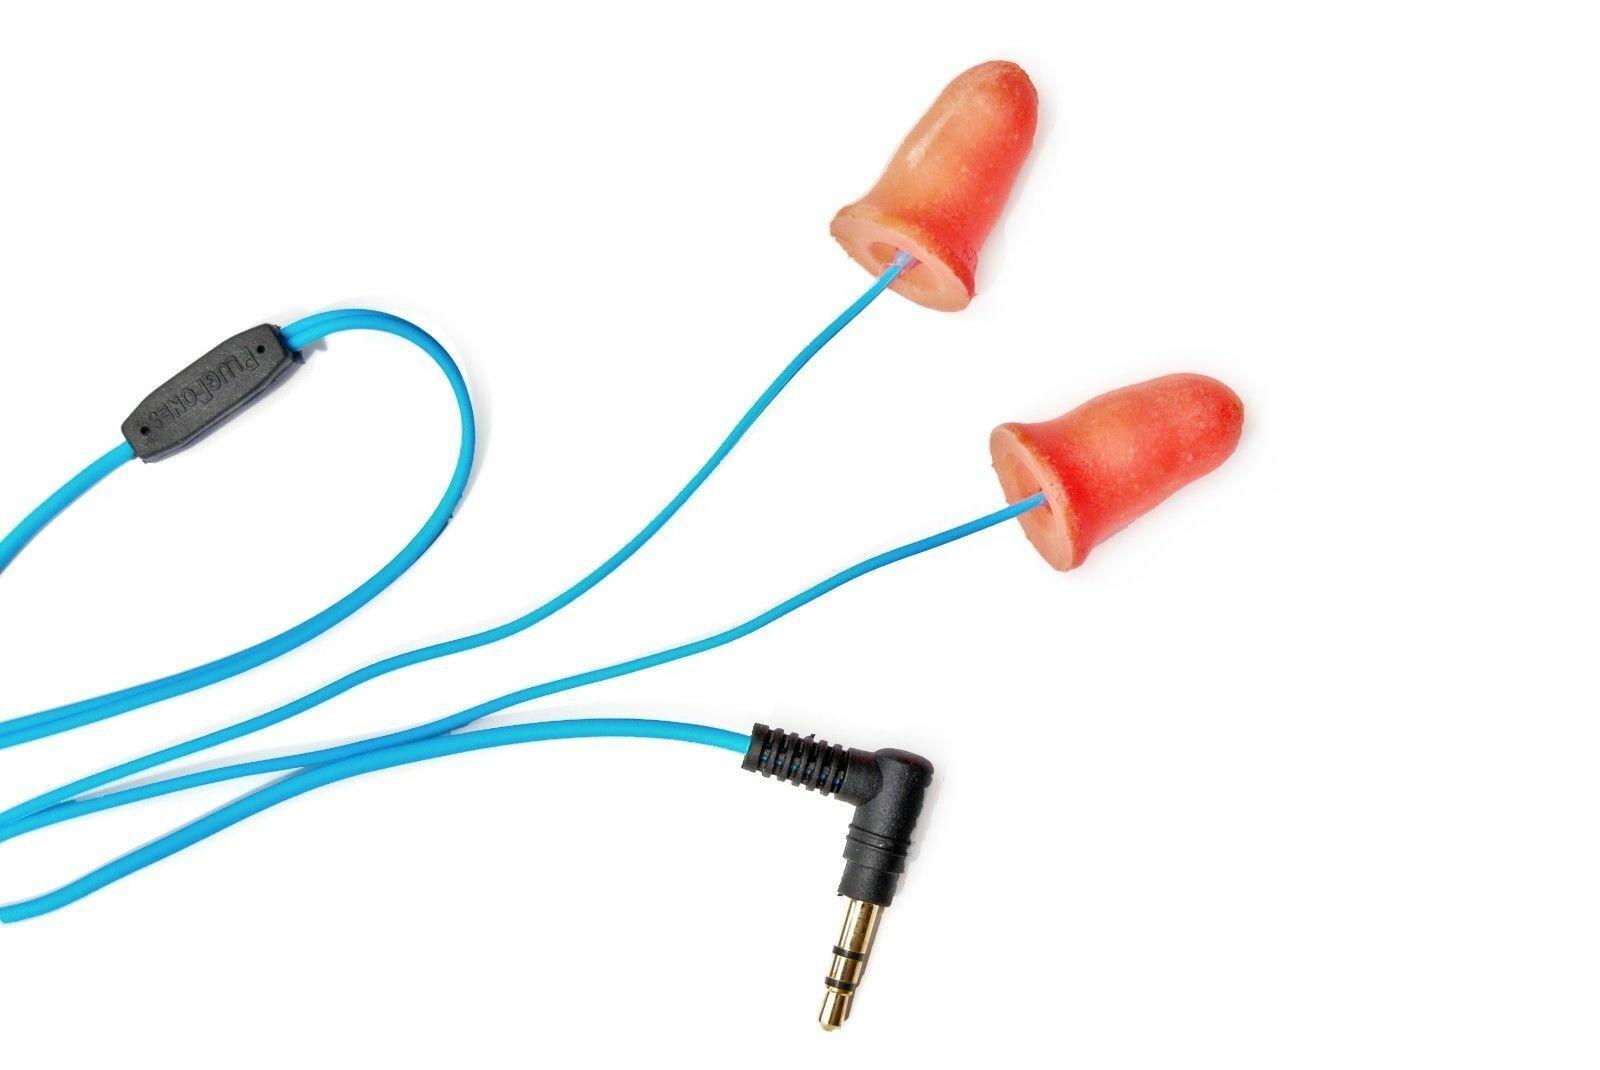 Orange Plugfones NOISE ISOLATING, EARBUDS EARPLUGS HEADPHONES HEARING PROTECTION